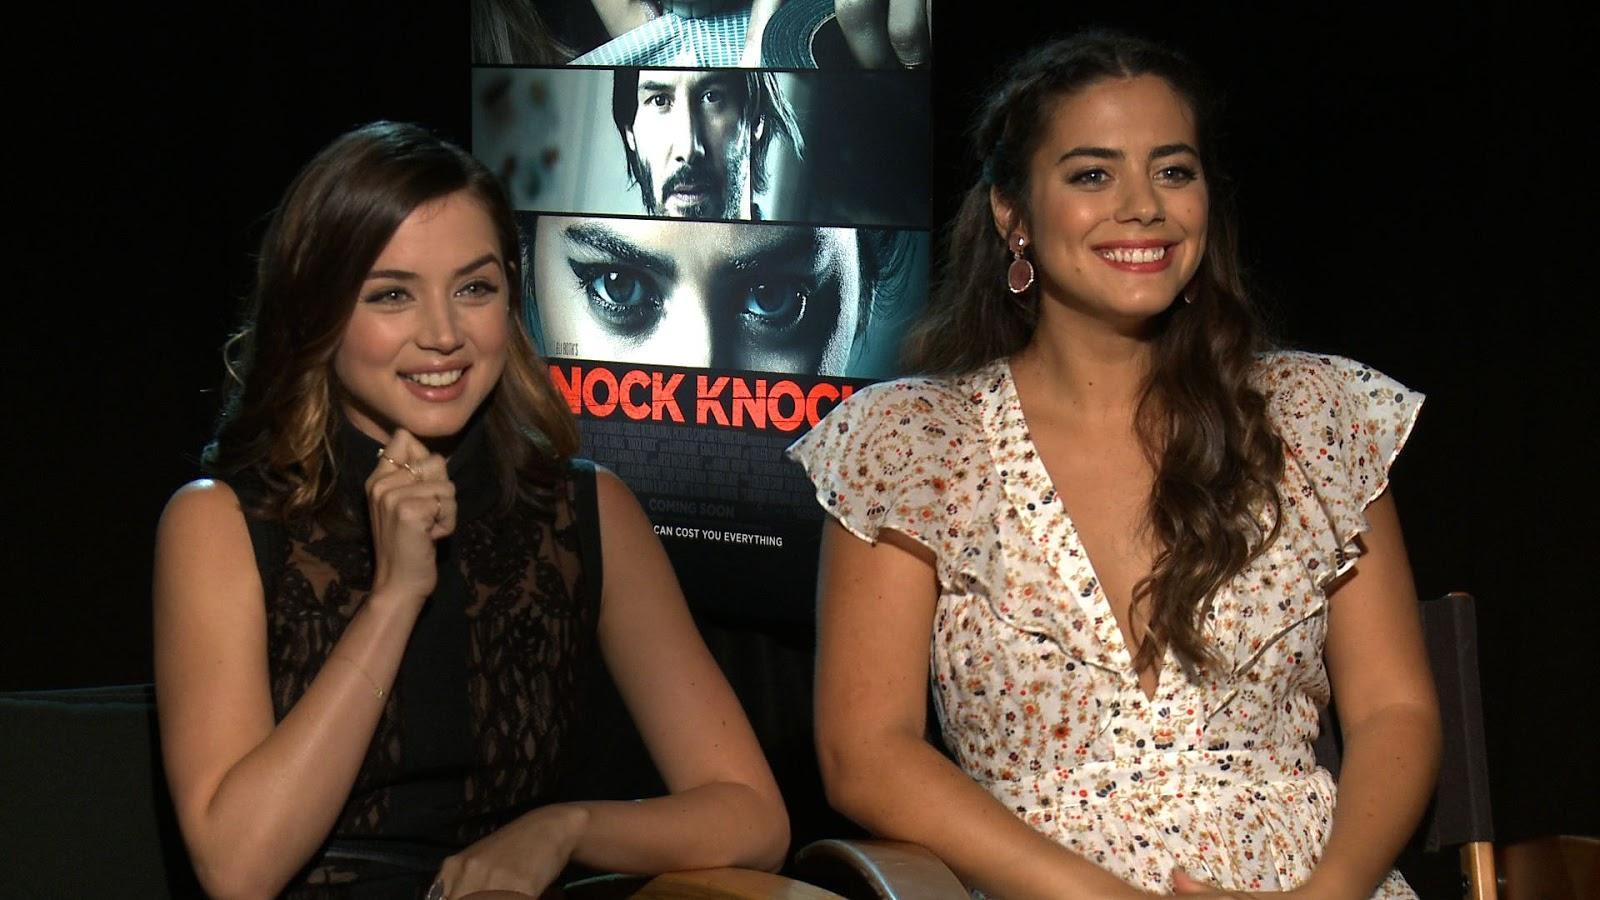 Ana De Armas Lorenza Izzo Knock Knock 2015 Stock Photo: Video Interview: Lorenza Izzo And Ana De Armas Talk KNOCK